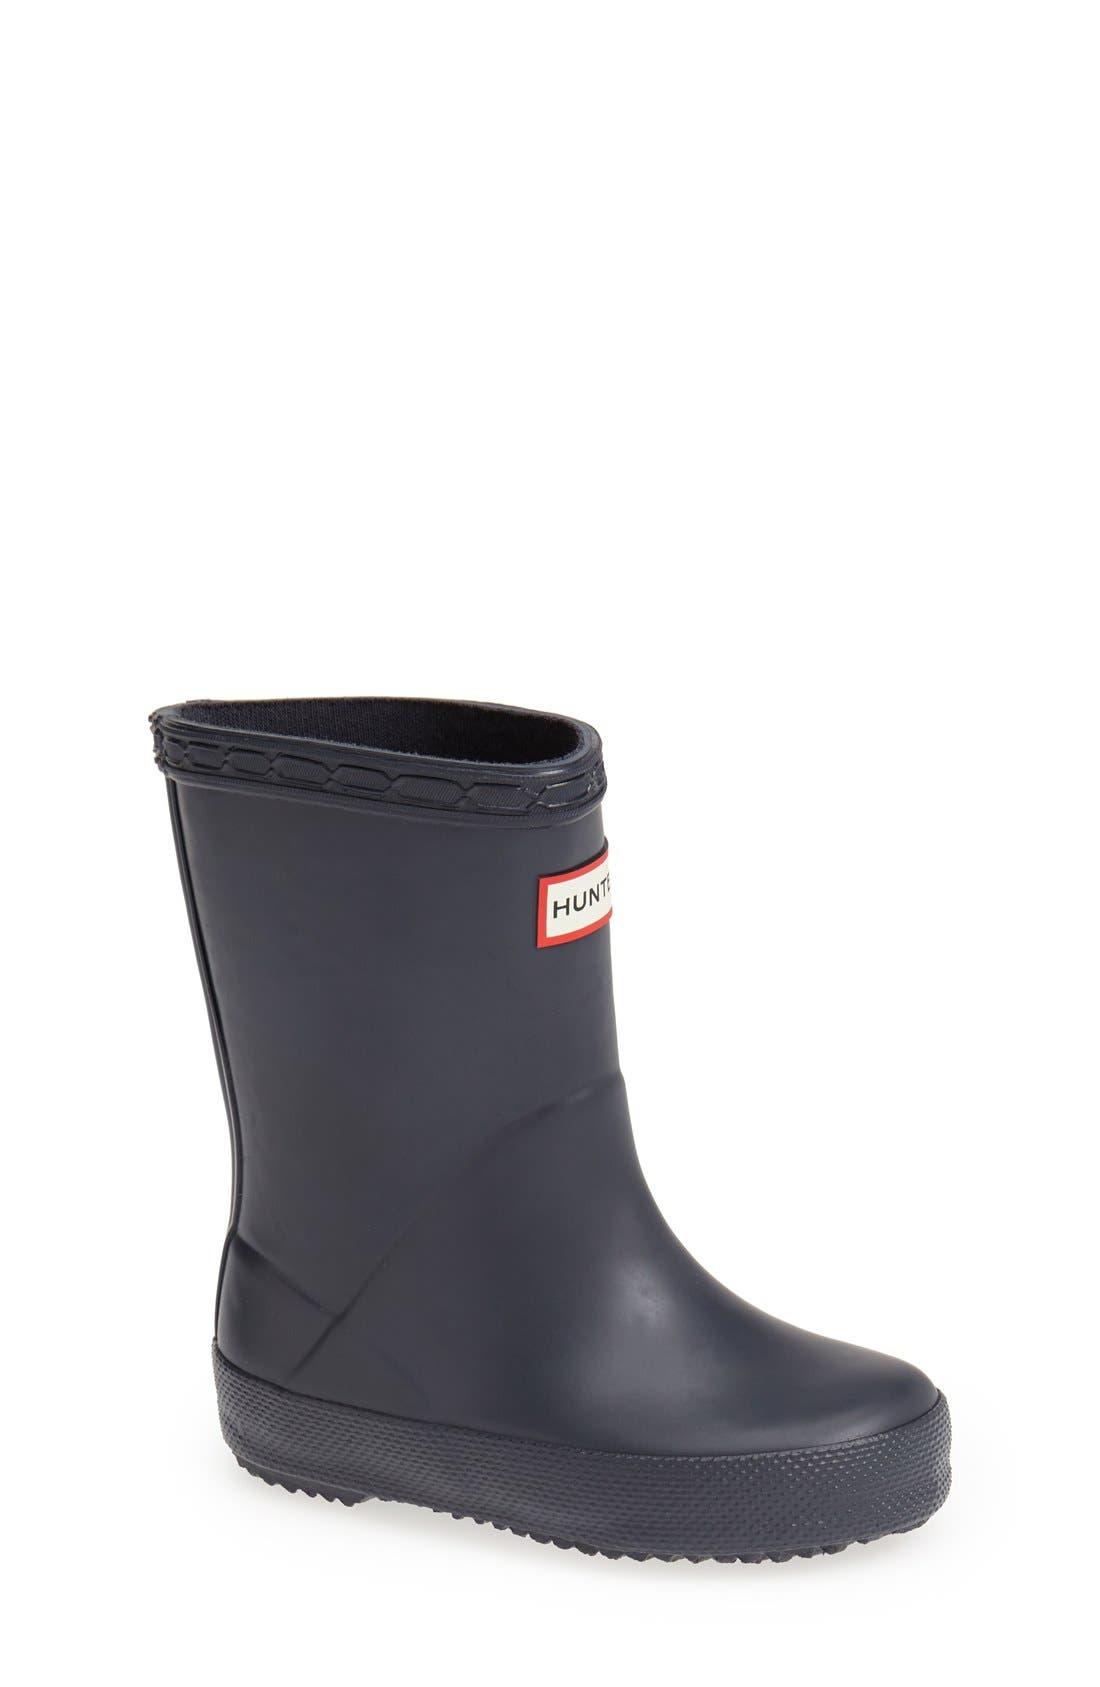 Alternate Image 1 Selected - Hunter 'First Classic' Rain Boot (Walker, Toddler & Little Kid)